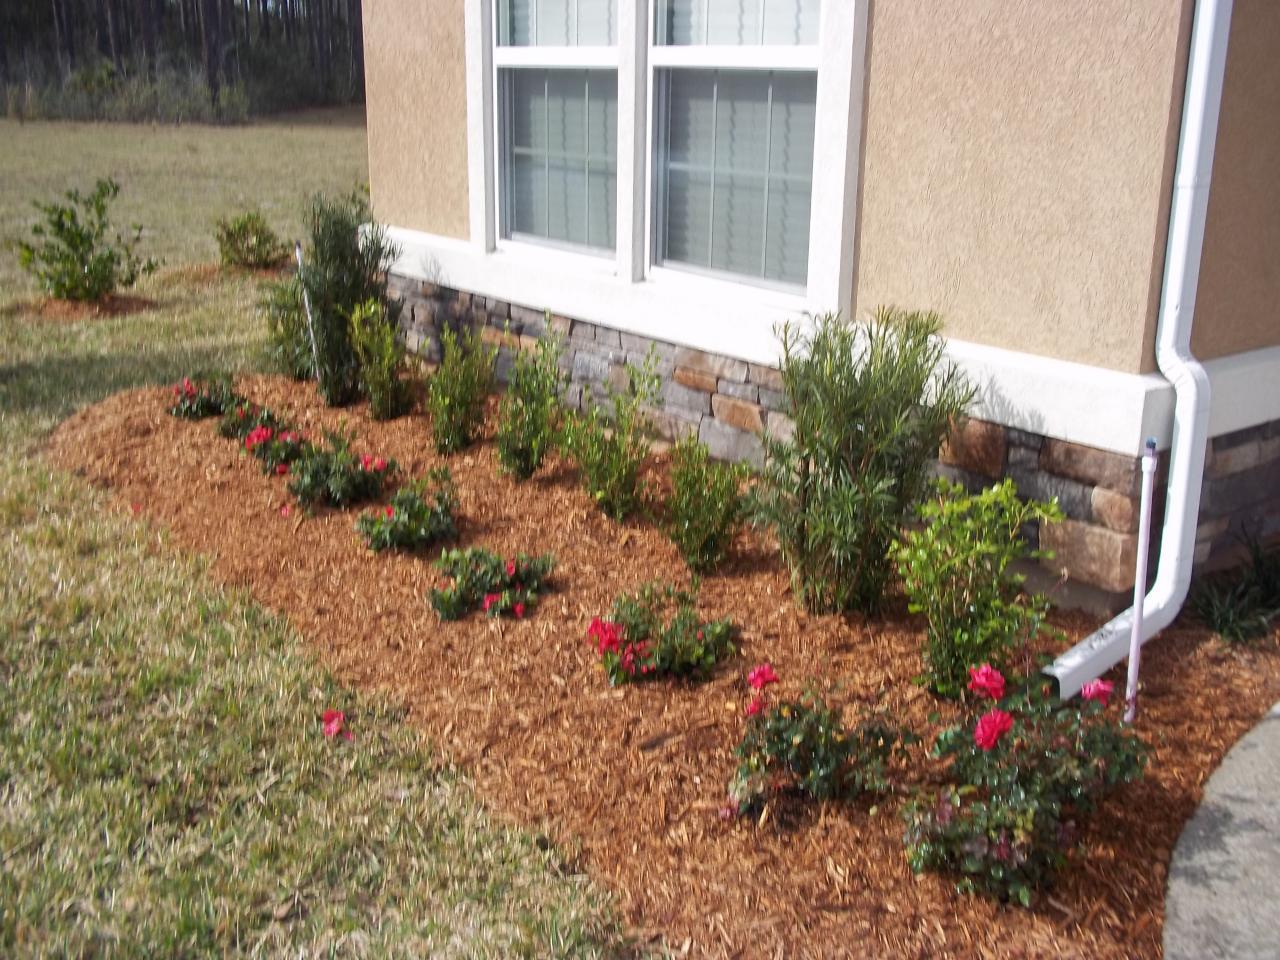 Landscaping With Boxwoods And Roses : Podocarpus boxwood red ruffle azalea and knockout roses